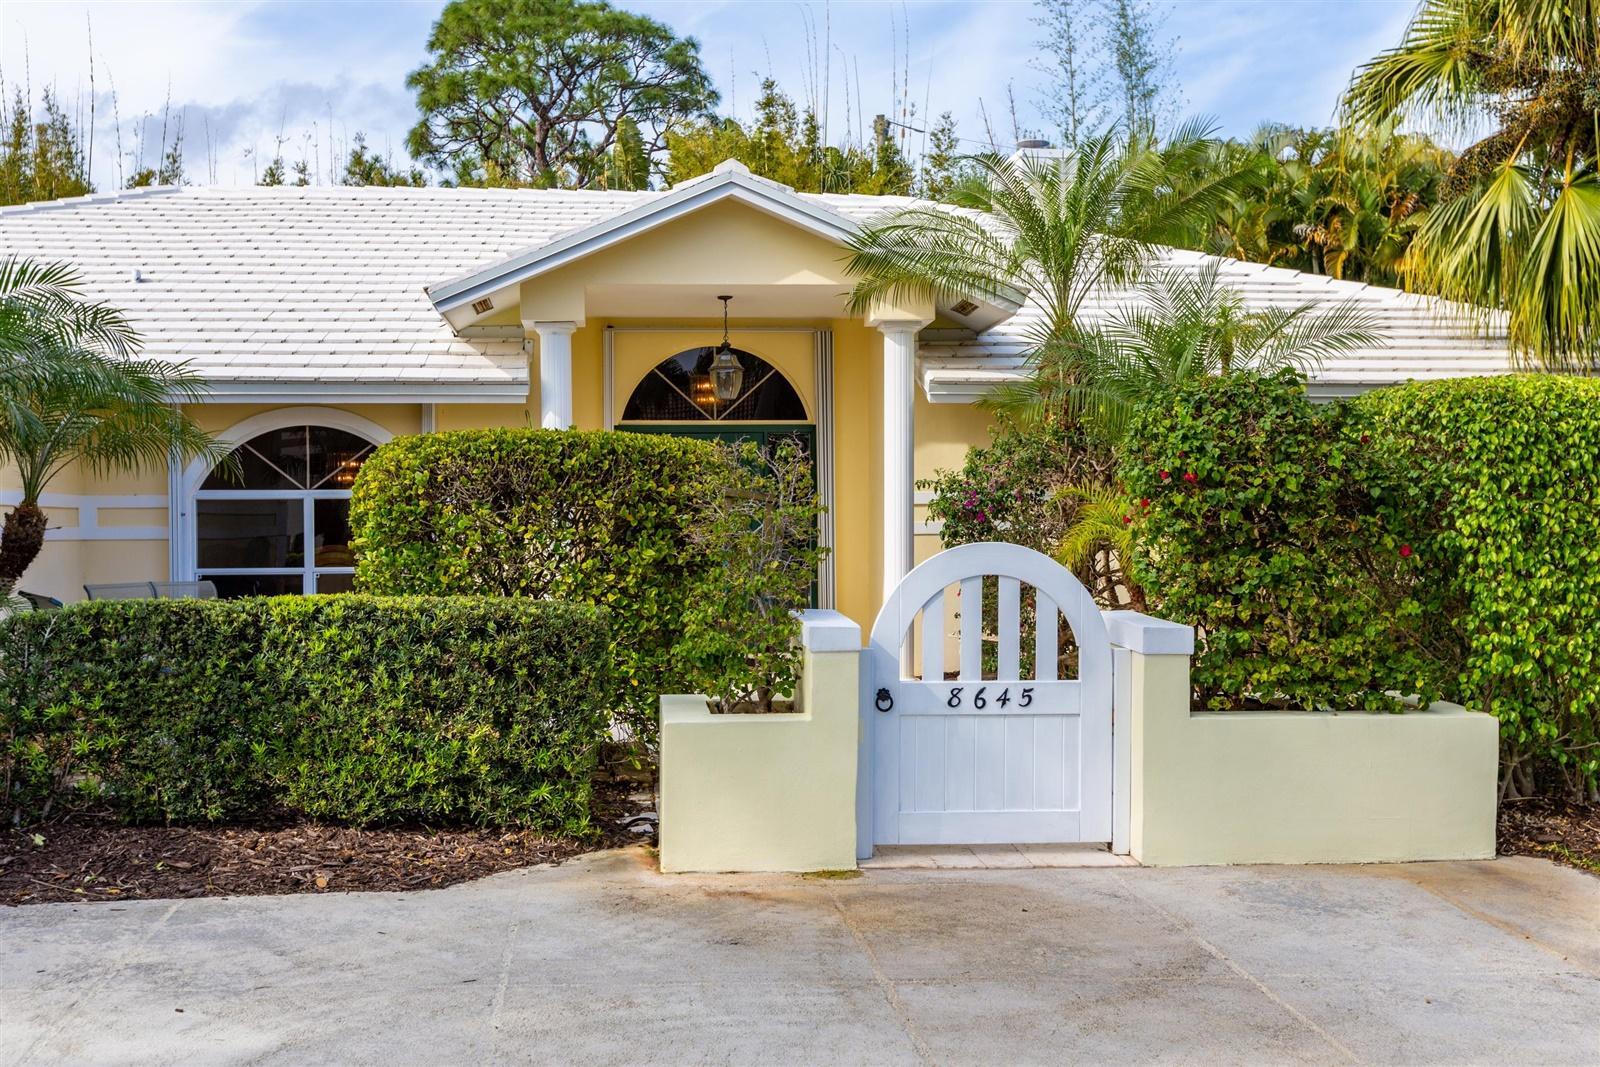 8645 SE Gulfstream Place, Hobe Sound, Florida